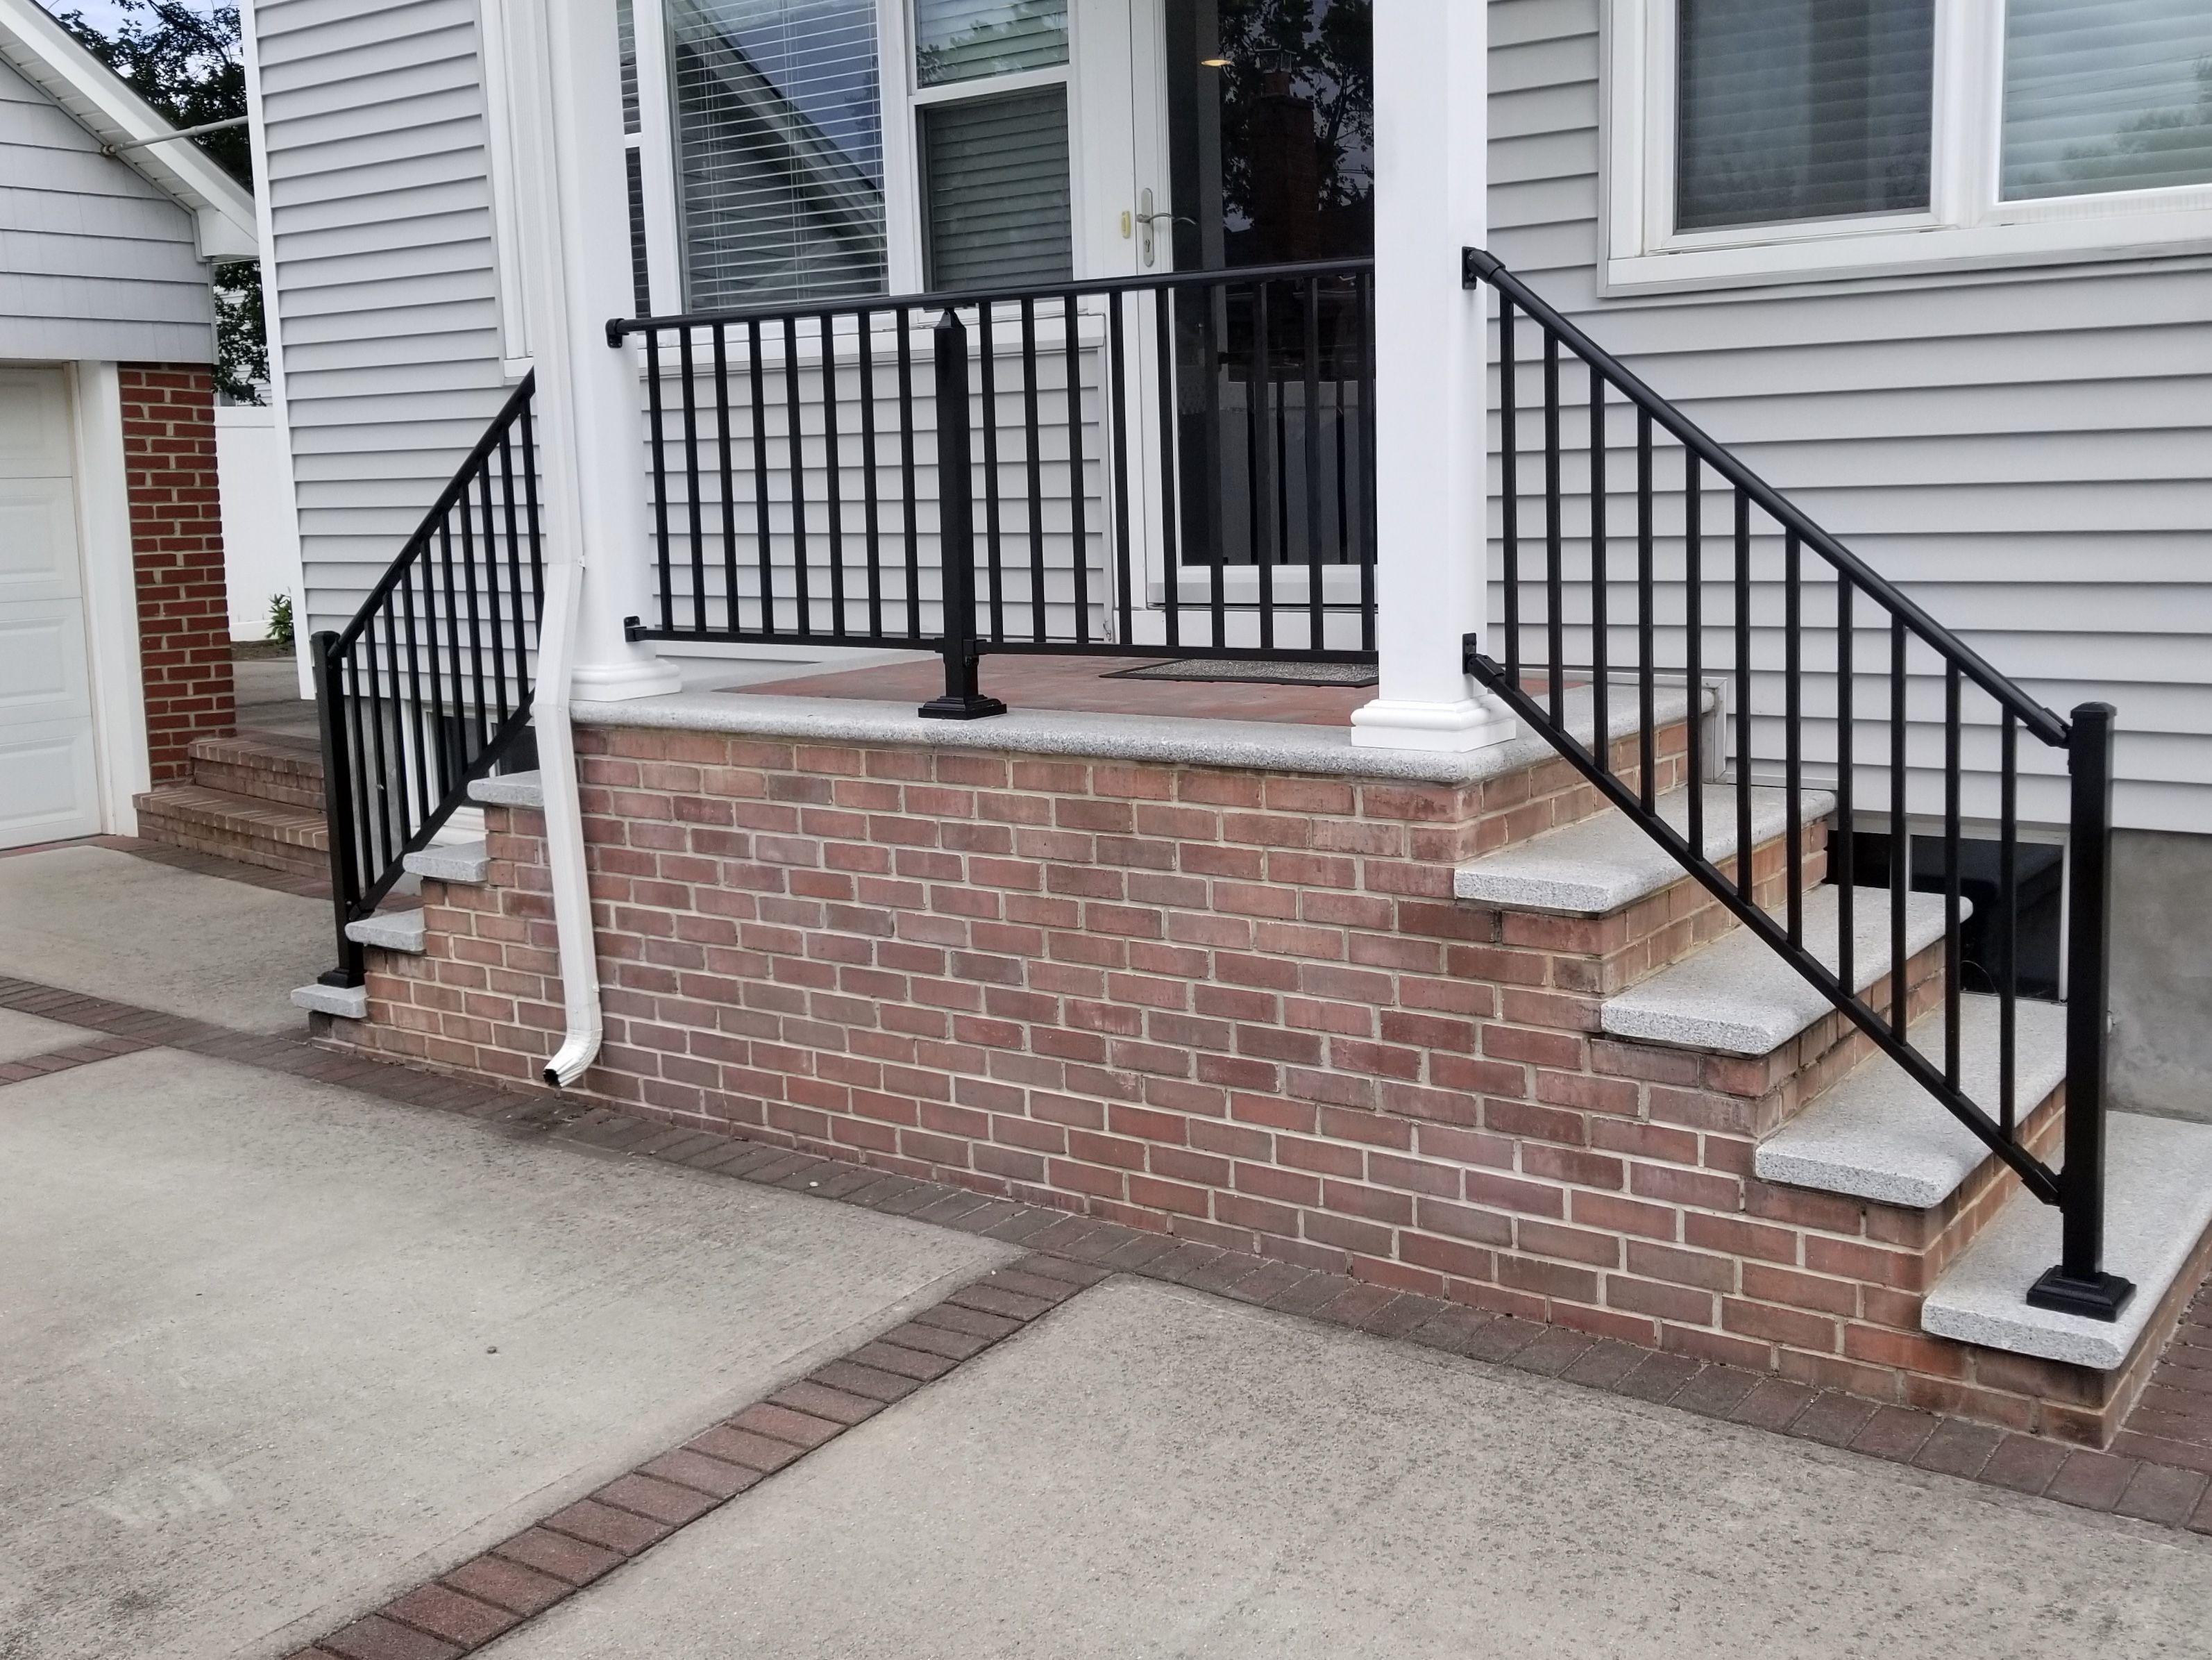 Aluminum Handrails On Concrete Steps Aluminum Fence Concrete   Aluminum Handrails For Concrete Steps   Stair   Wood   Front Porch   Back Patio   Mobile Home